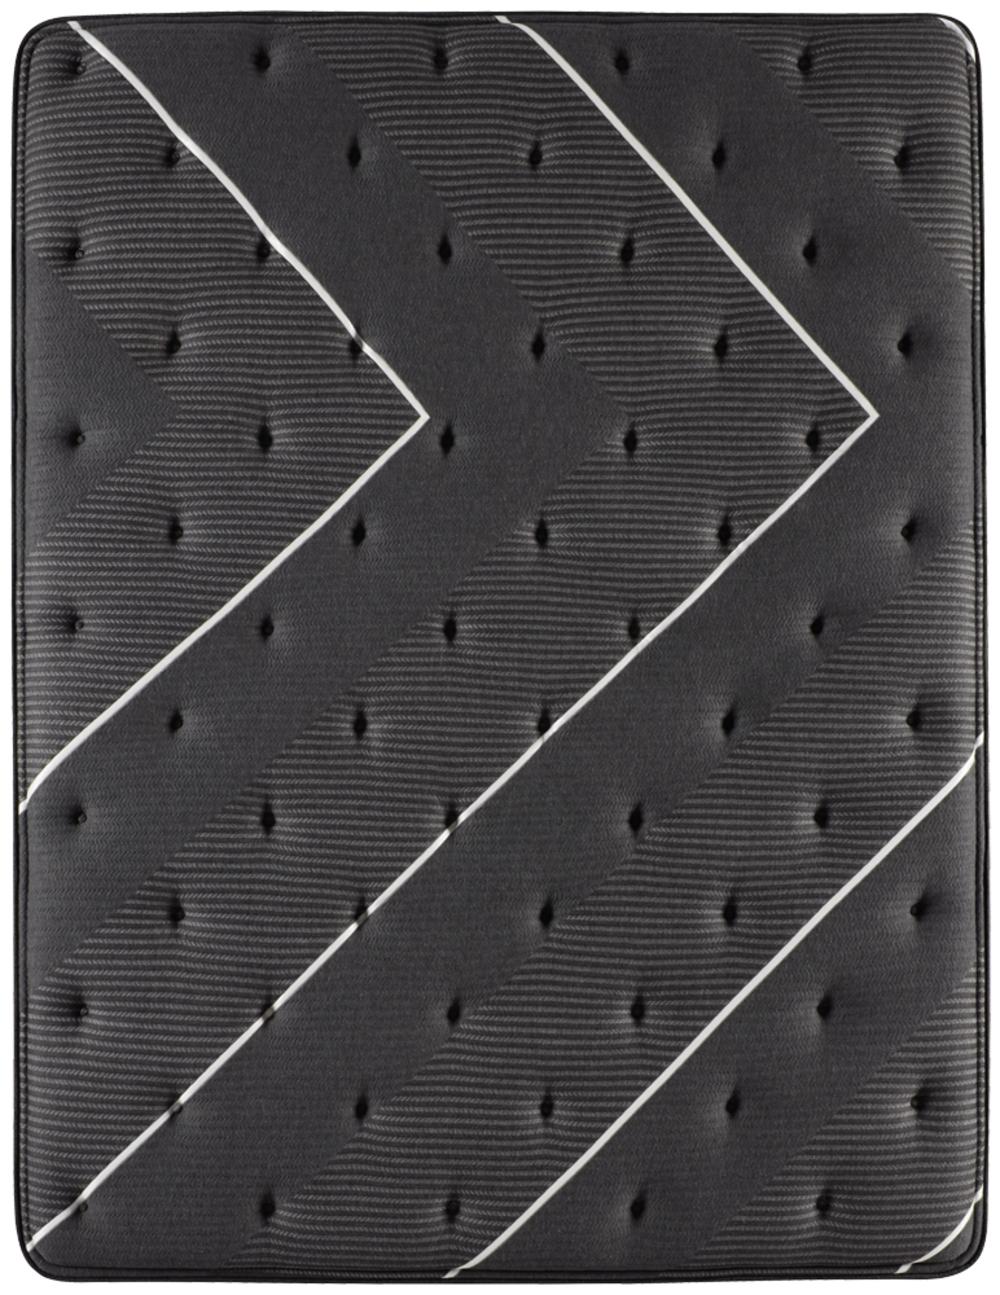 Beautyrest - BR Black C Class Medium PT Mattress with BR Advanced Motion Base